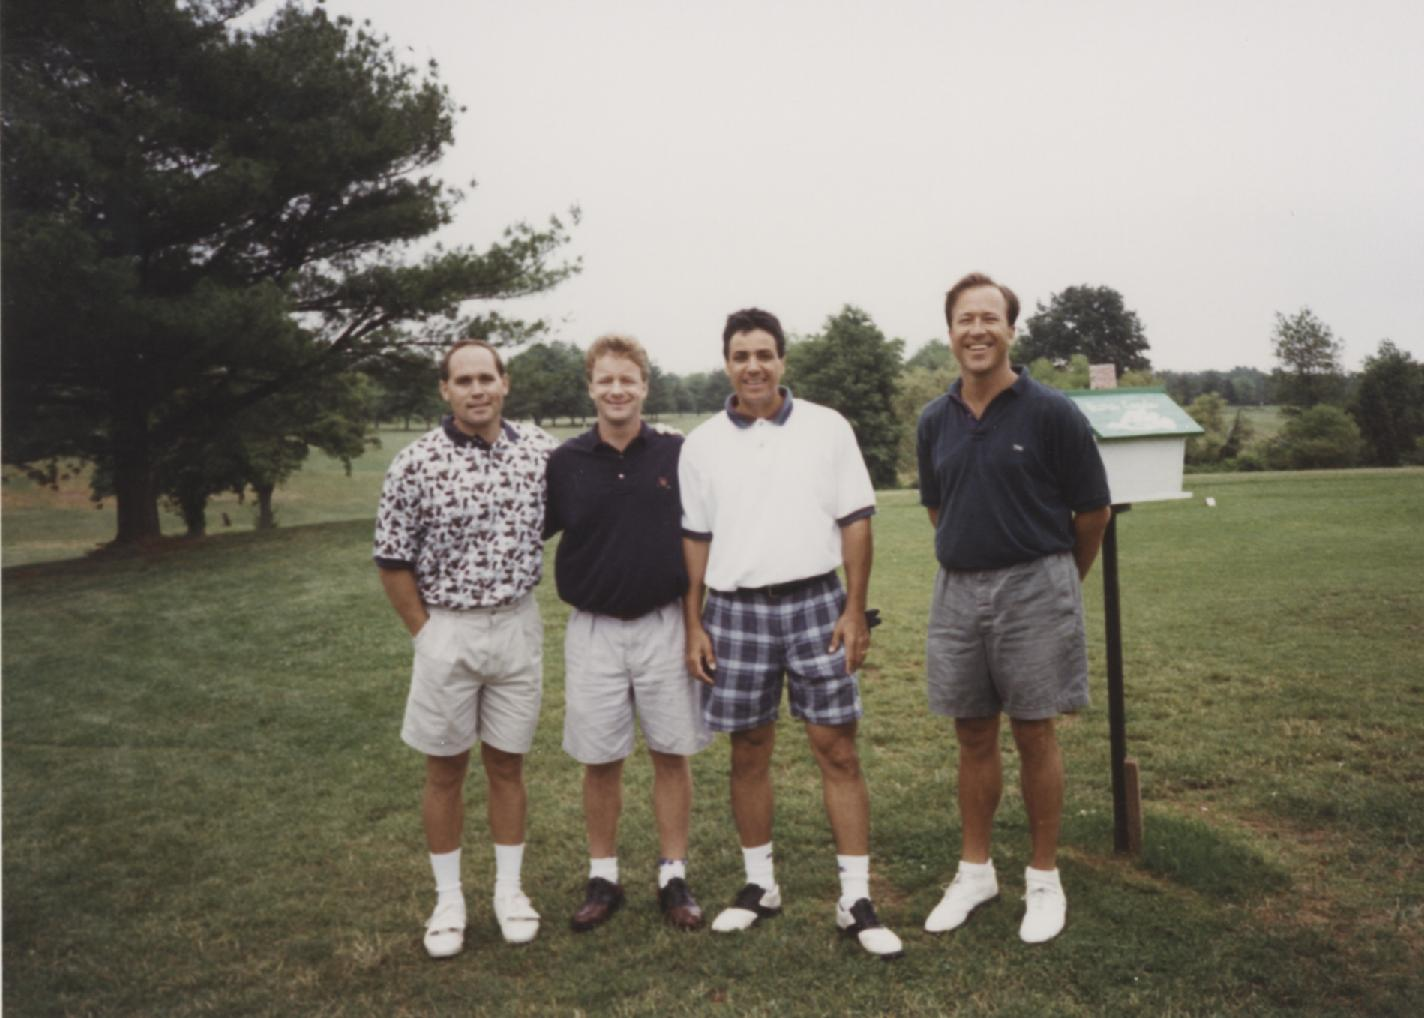 Dlk Mgt 1995 David L Kaltman Memorial Golf Tournament